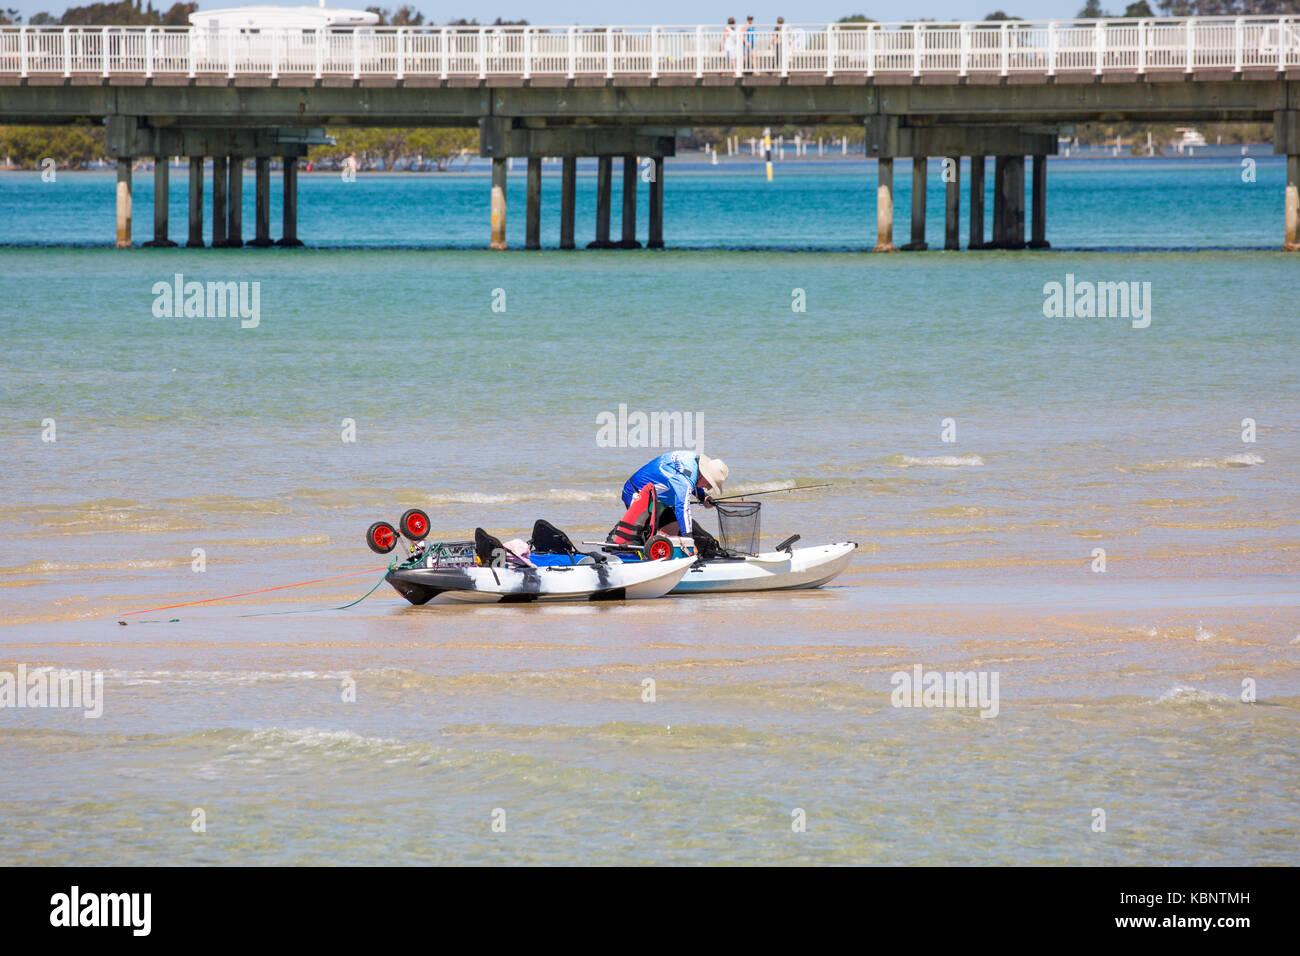 Man fishing off a sandbar in Wallis Lake at Forster on the mid north coast of new south wales,australia - Stock Image